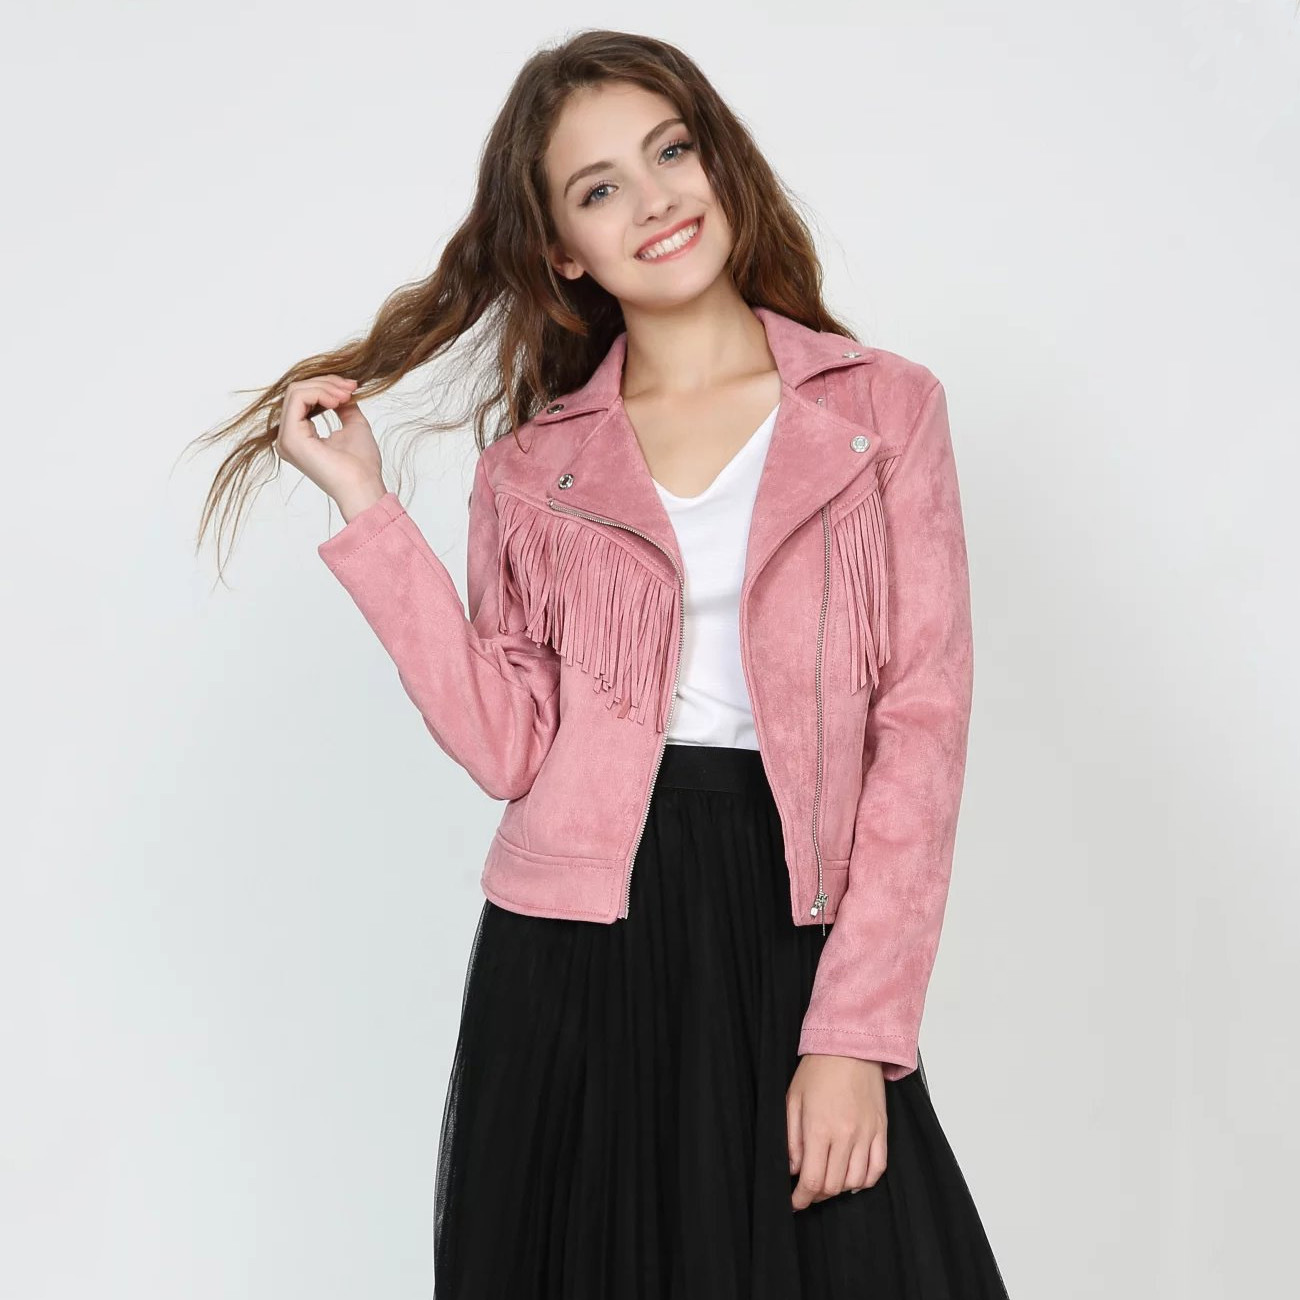 Laides Moto Biker Faux   Leather   Jacket New Spring Autumn Slim Short Pink Women Tassels   Suede   Jacket Turn Down Collar Punk Coats